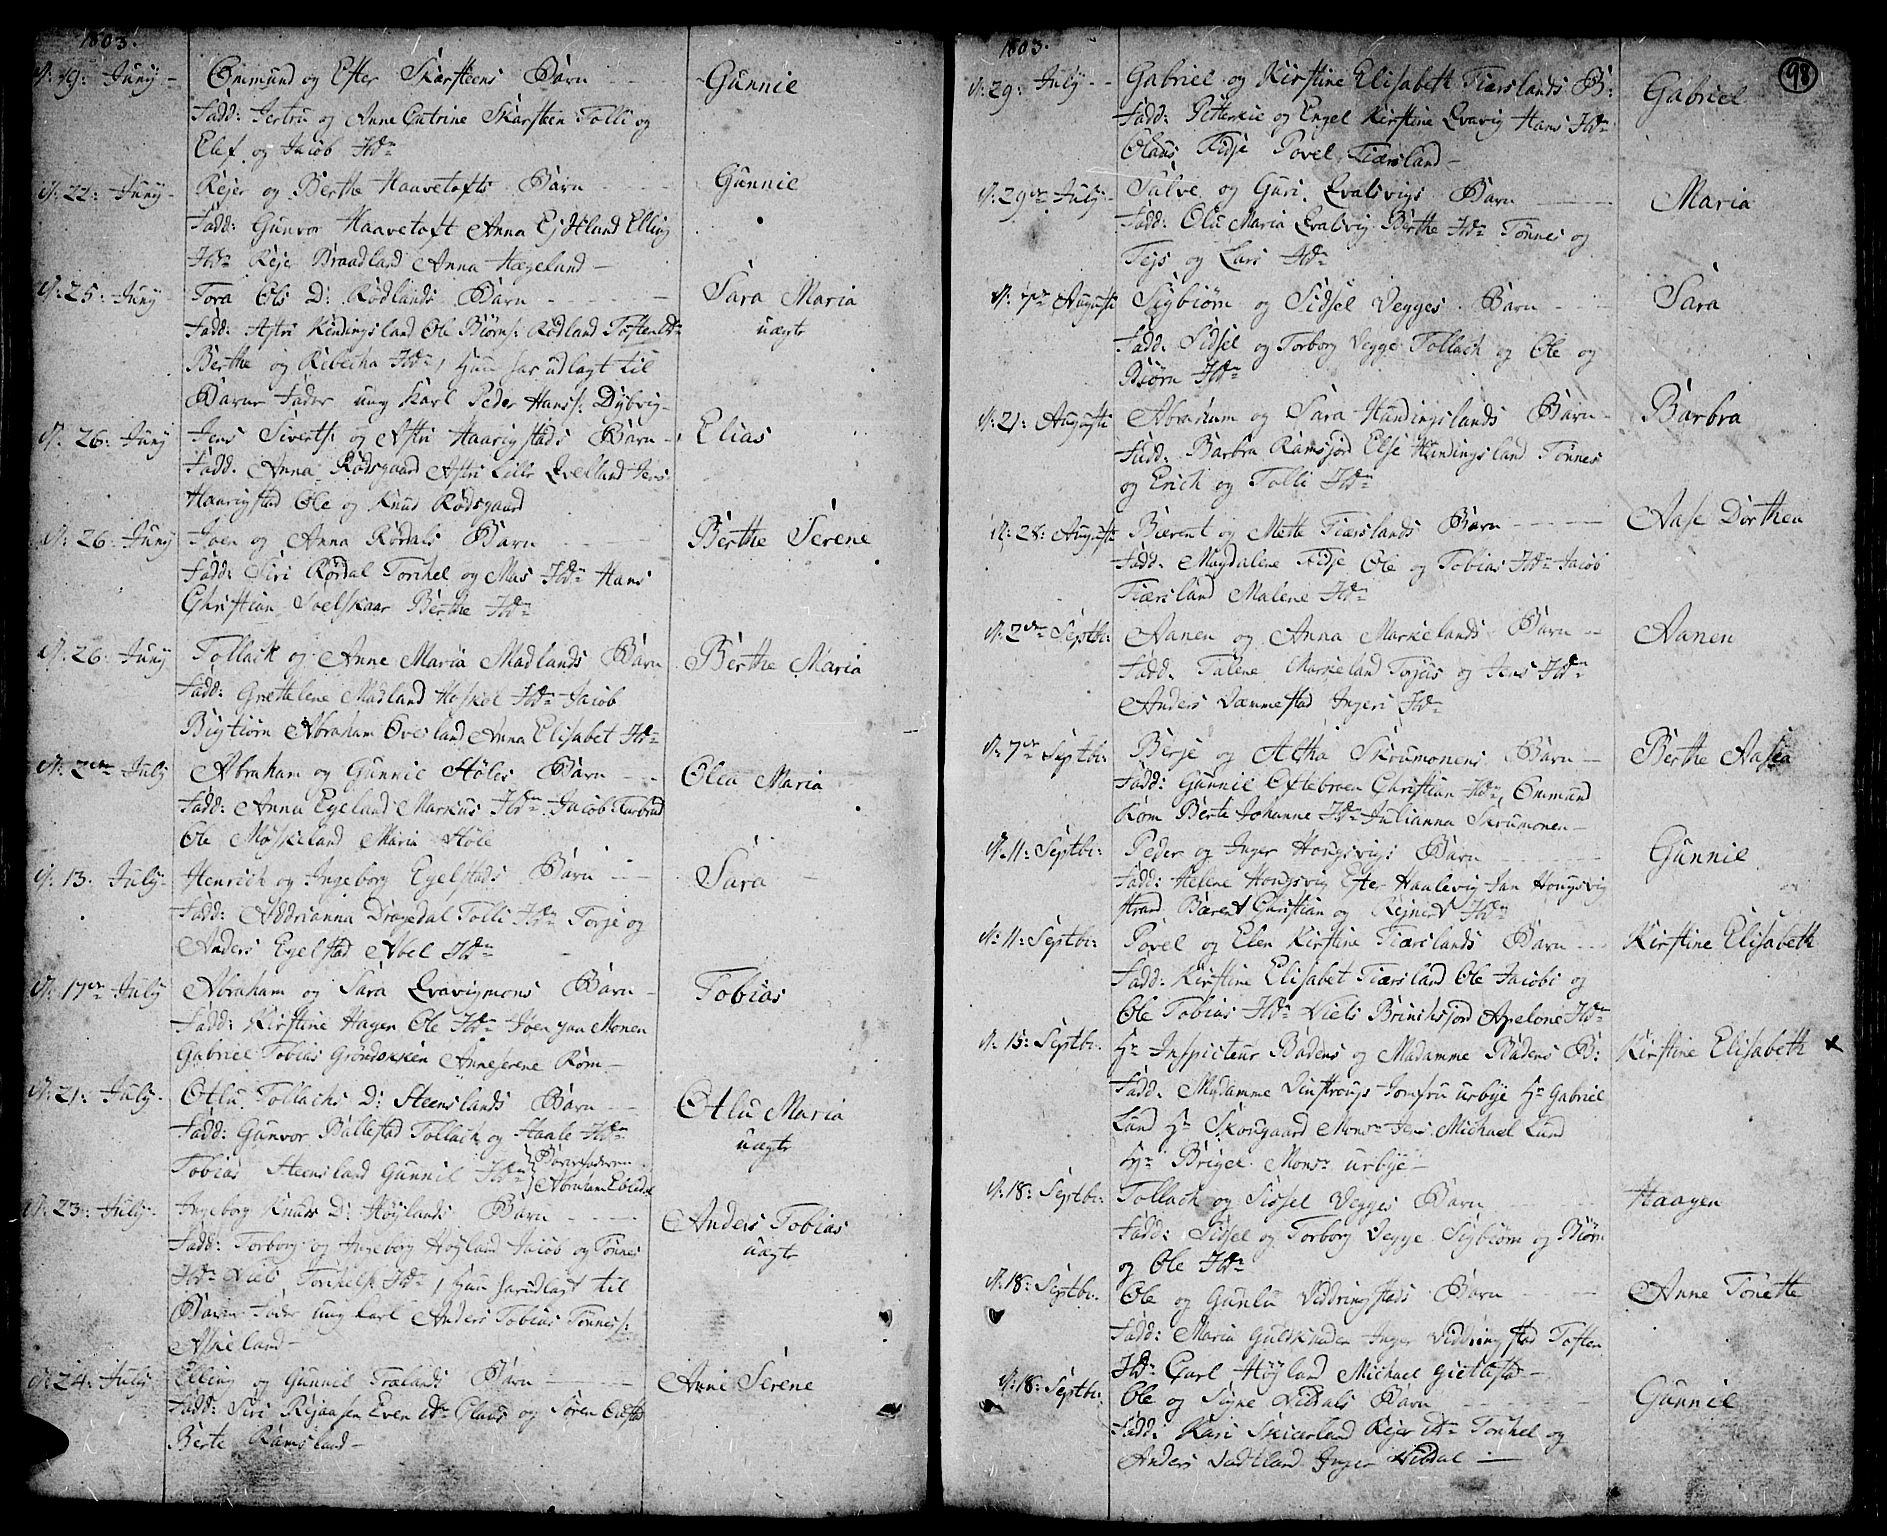 SAK, Lyngdal sokneprestkontor, F/Fa/Fac/L0004: Ministerialbok nr. A 4, 1780-1815, s. 98